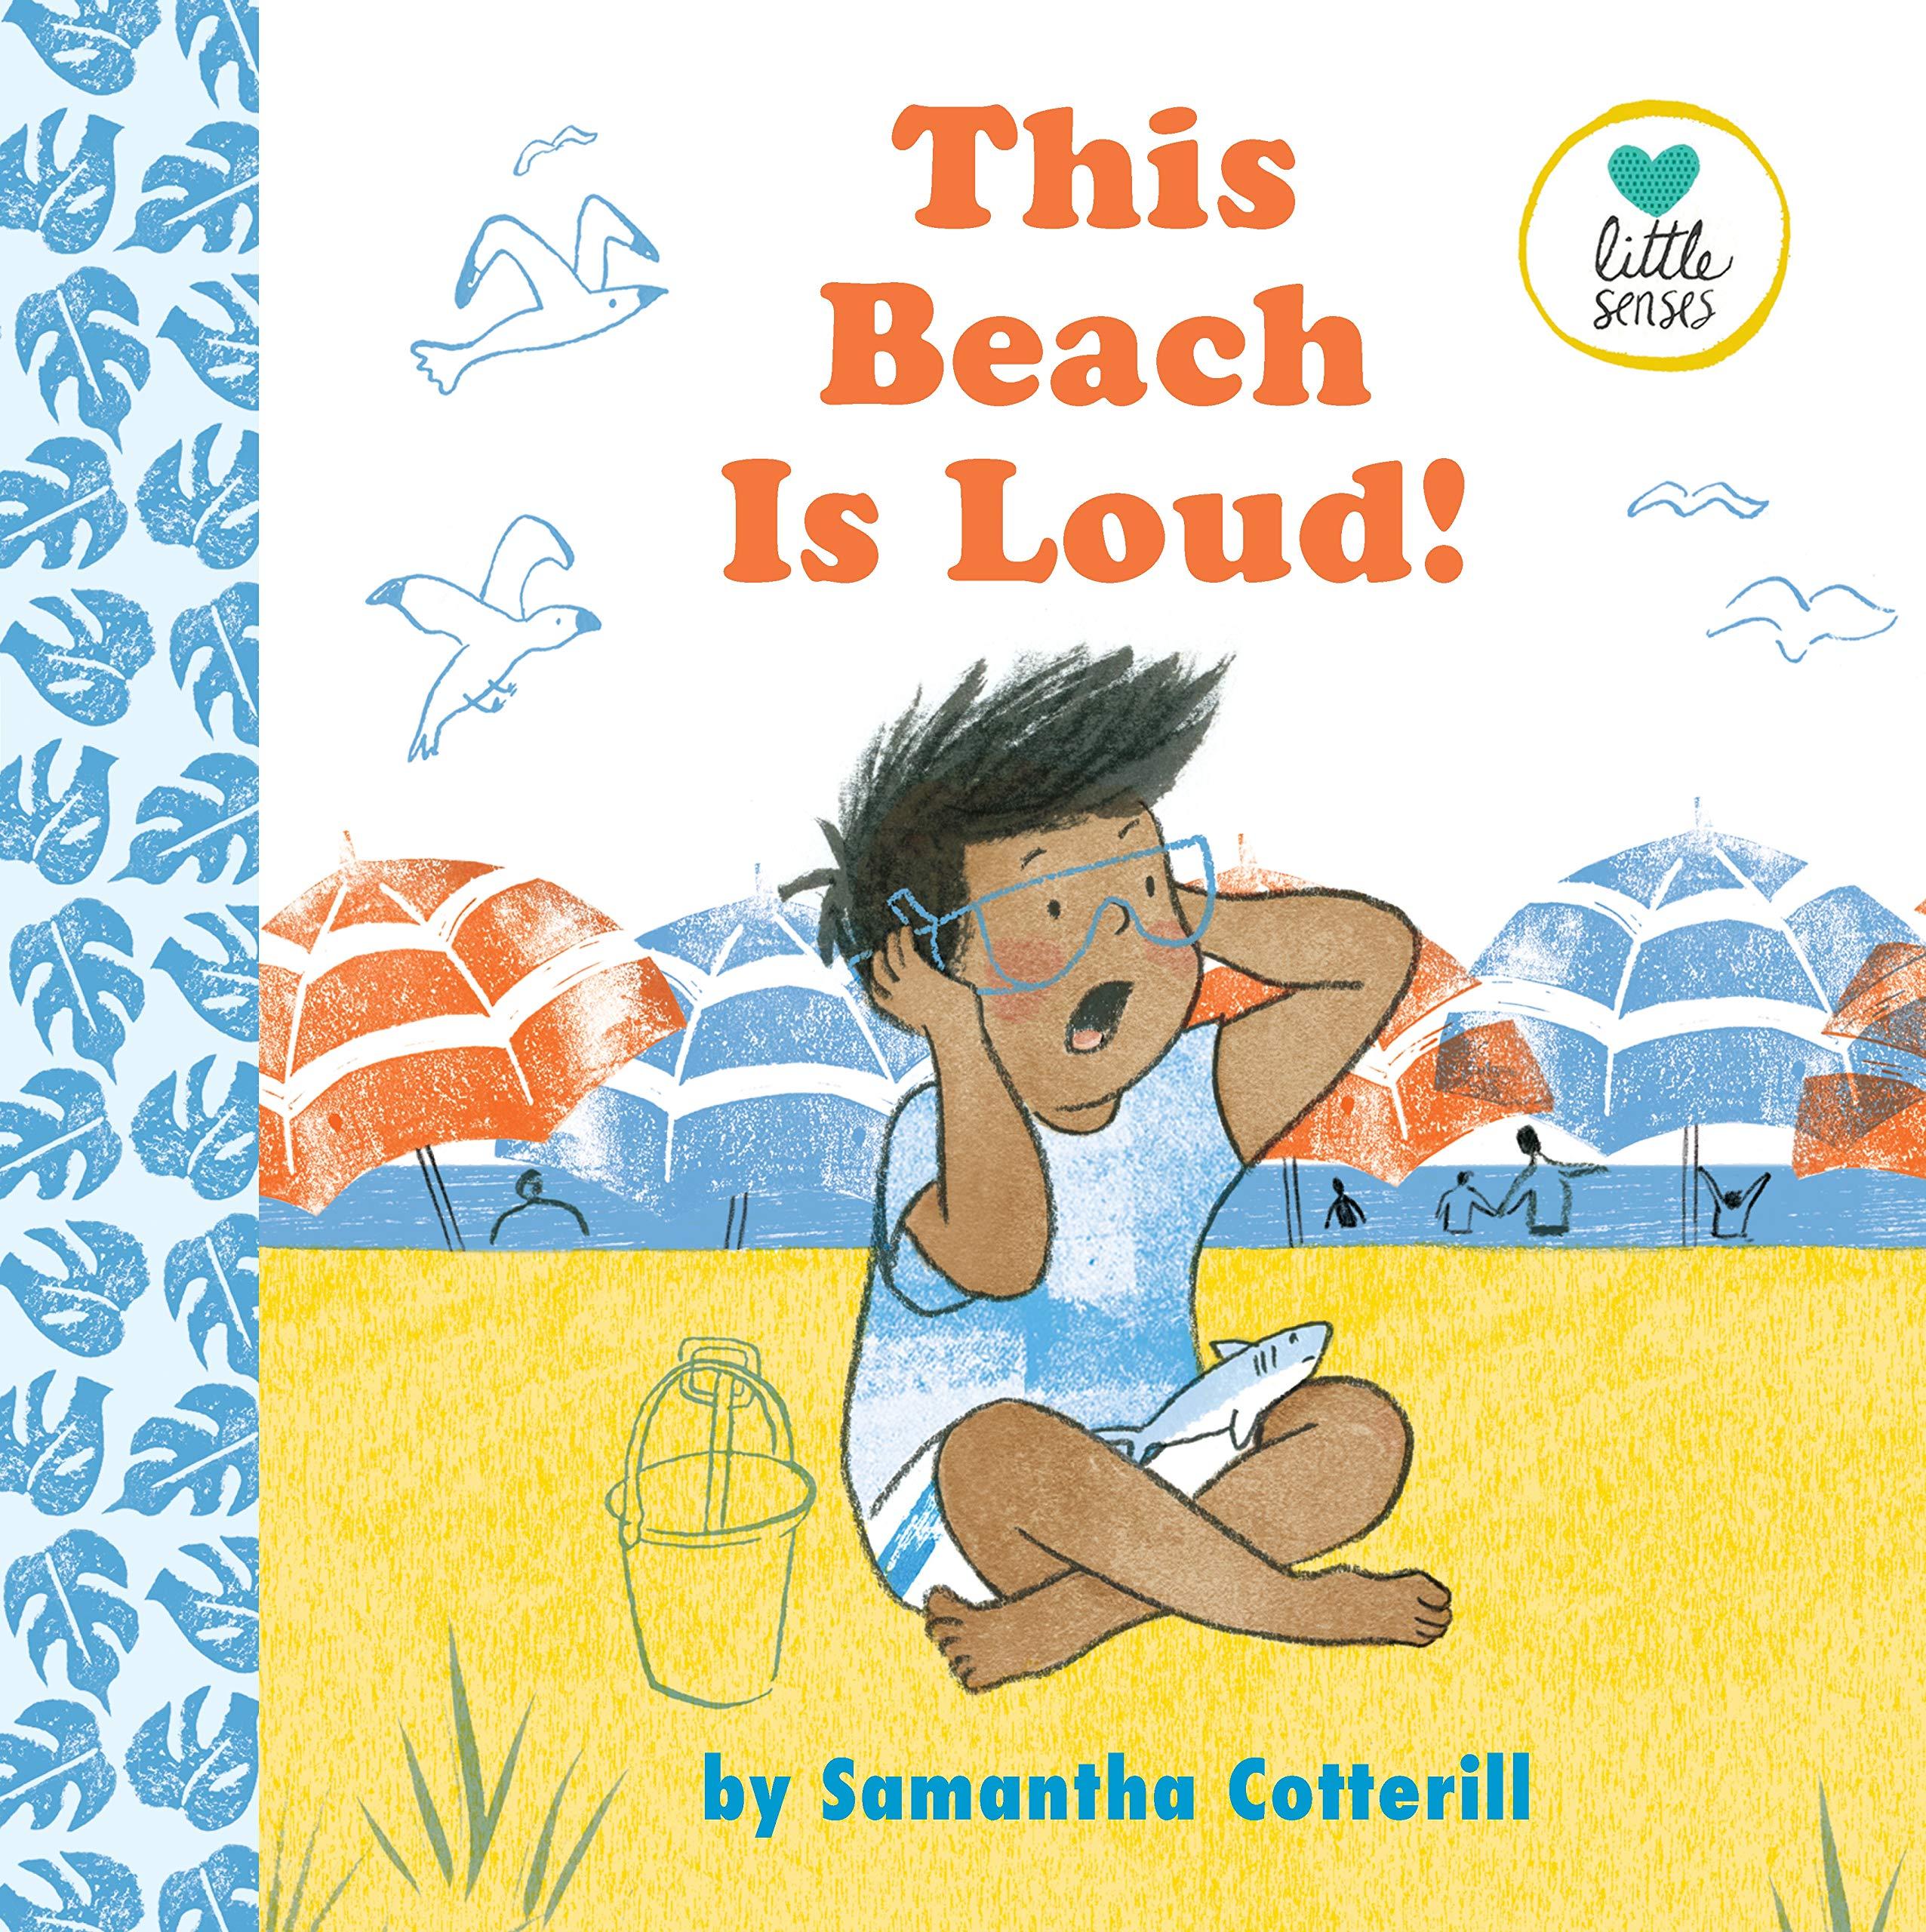 This Beach Is Loud! (Little Senses): Samantha Cotterill.